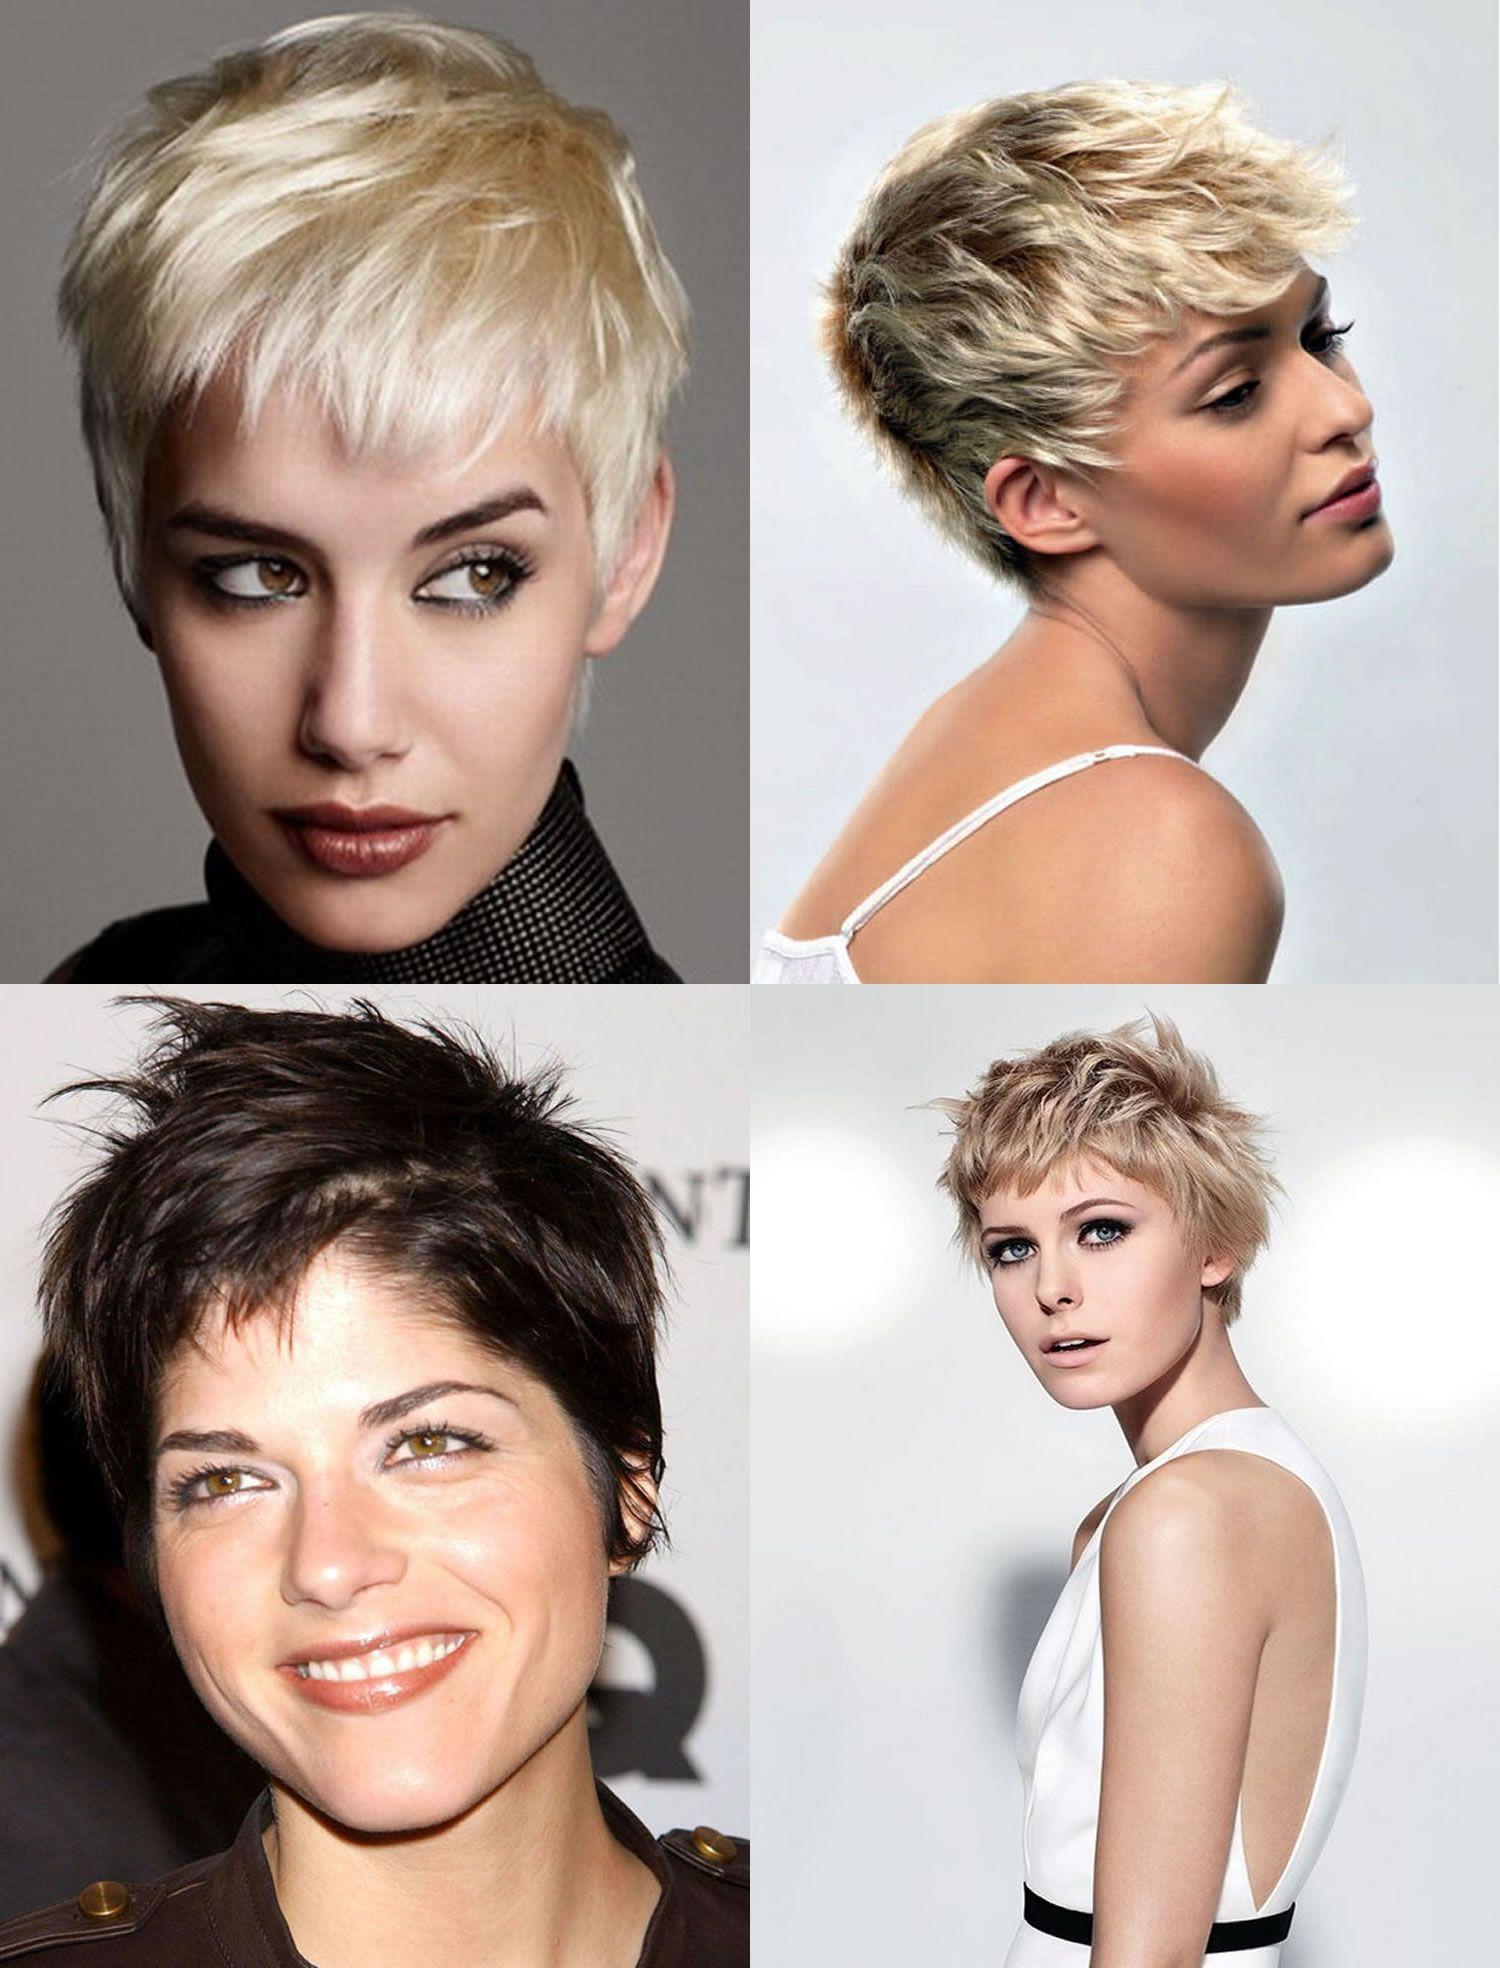 33 Unglaubliche Frisuren Fur Diamond Face Shape Face Shape Hairstyles Diamond Face Shape Hairstyles Diamond Face Shape